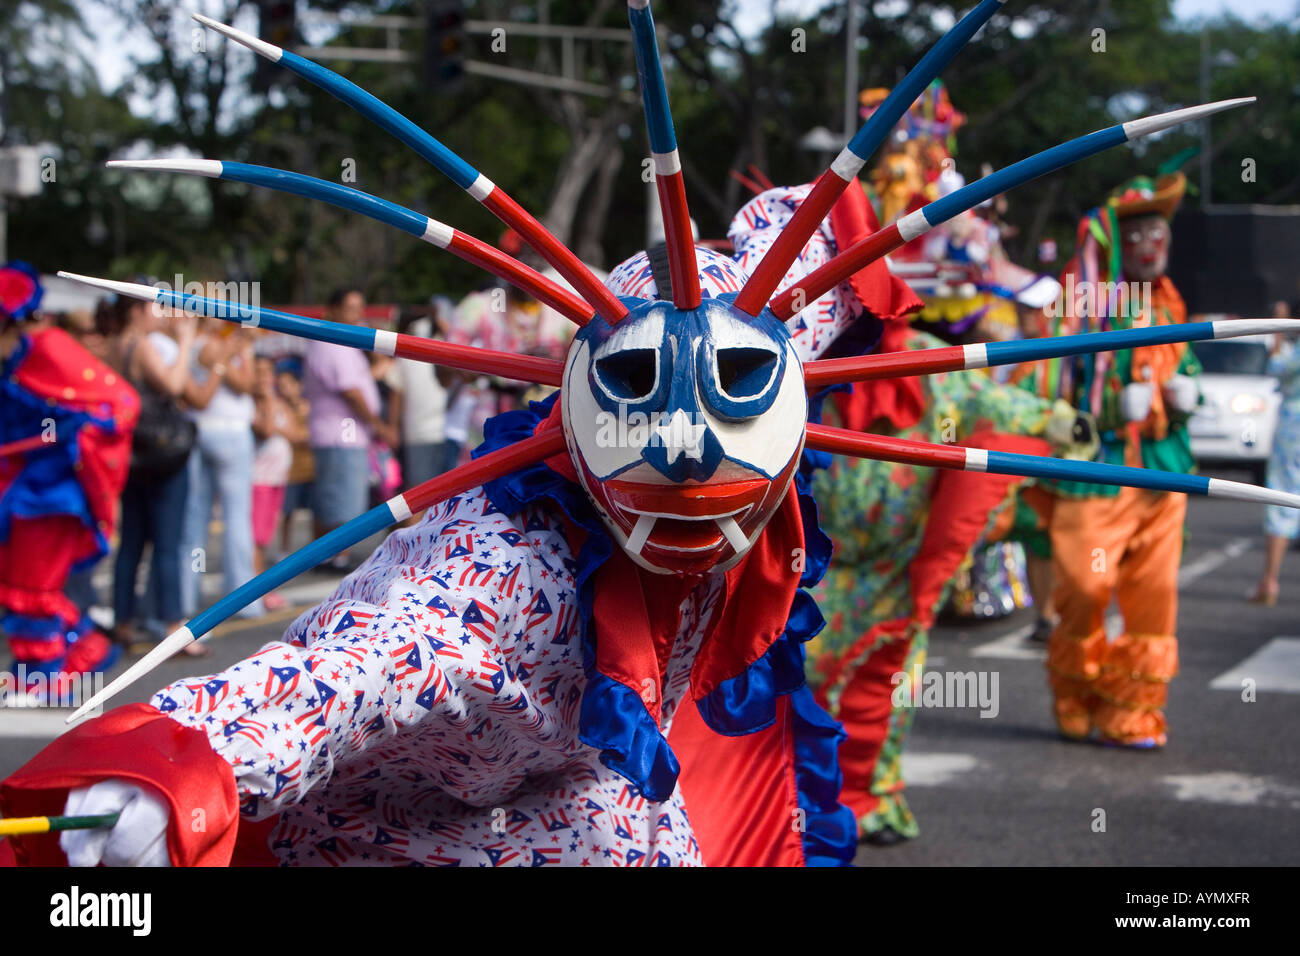 christmas parade san juan puerto rico stock image - Puerto Rican Christmas Traditions